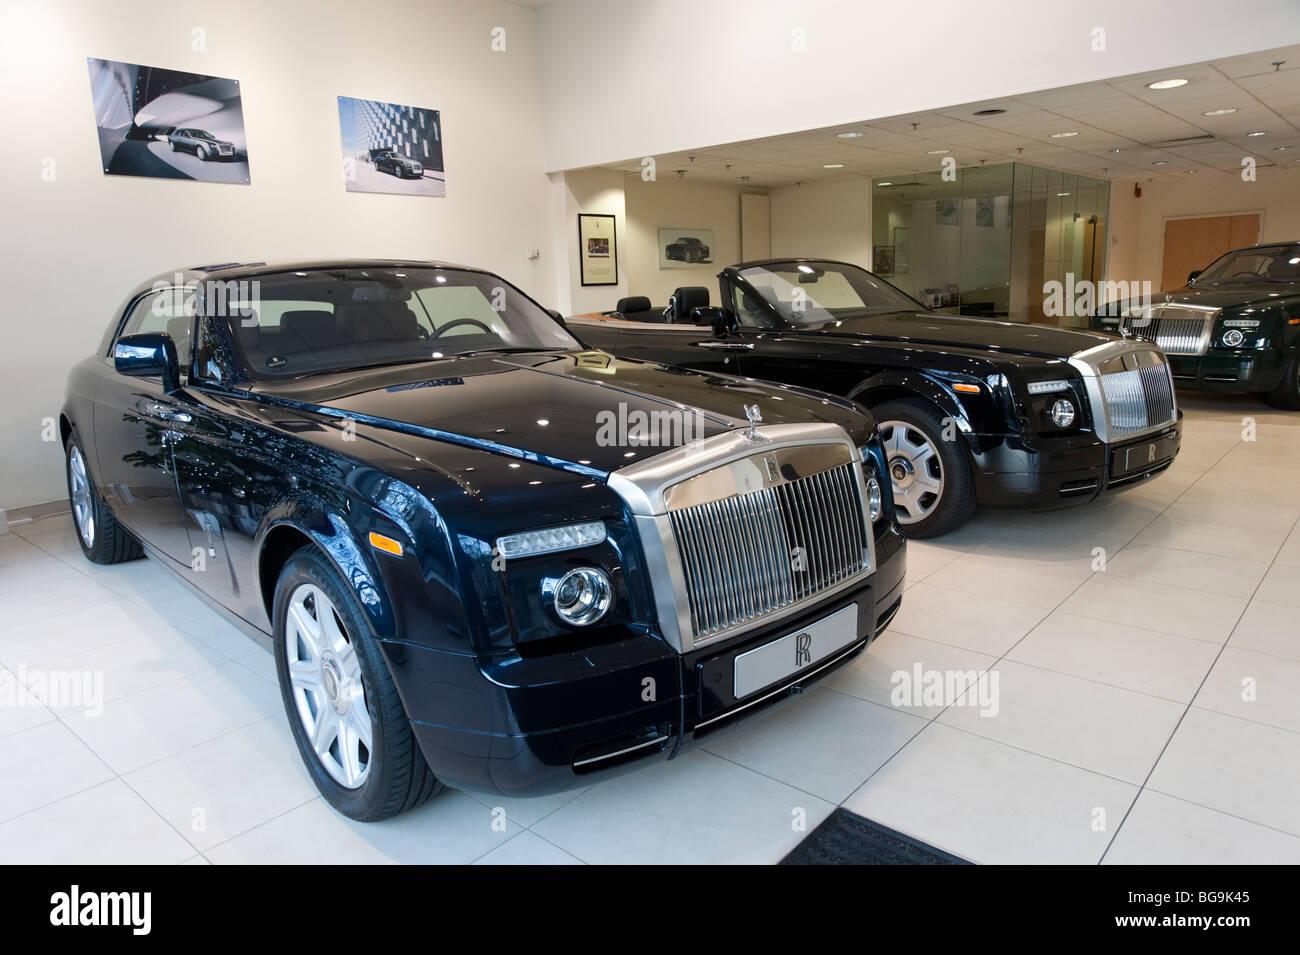 Rolls Royce Car Showroom In Mayfair London England Uk Stock Photo